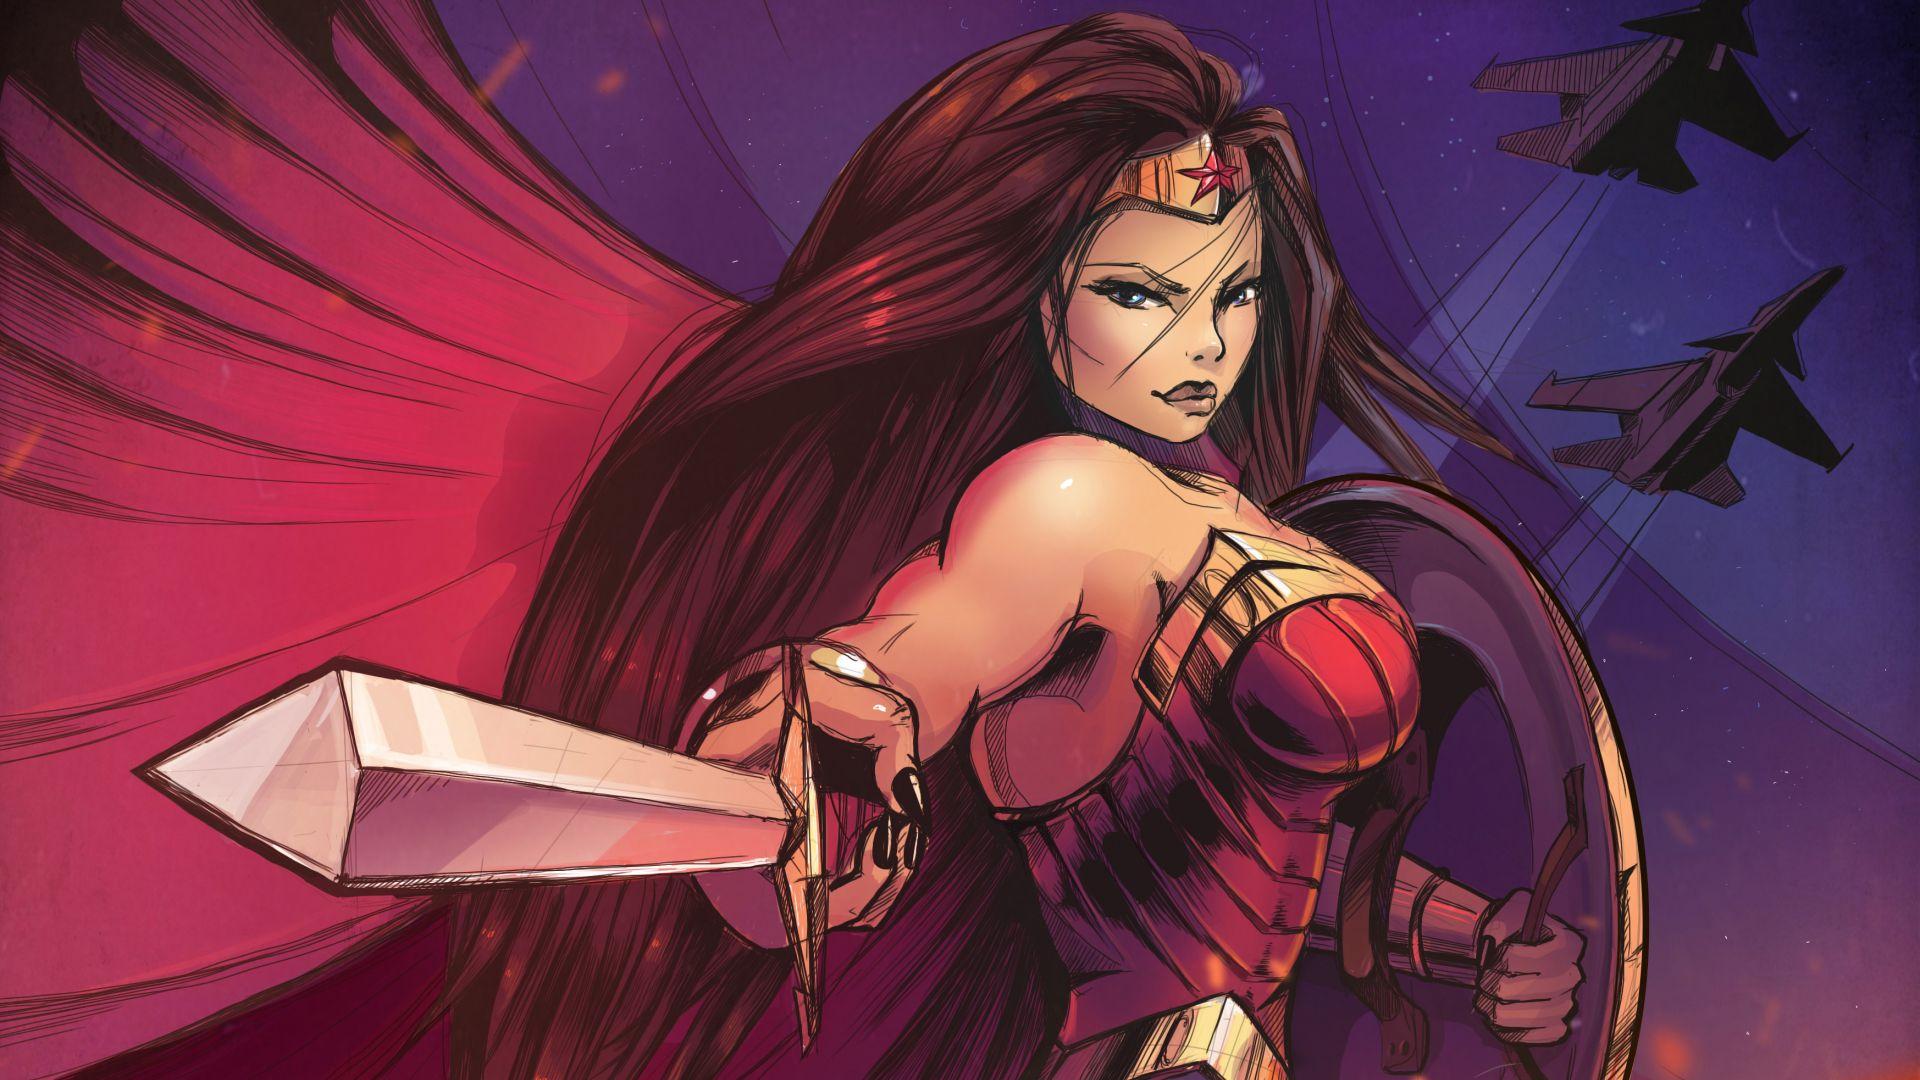 Desktop Wallpaper Wonder Woman Fanart Superhero 4k Hd Image